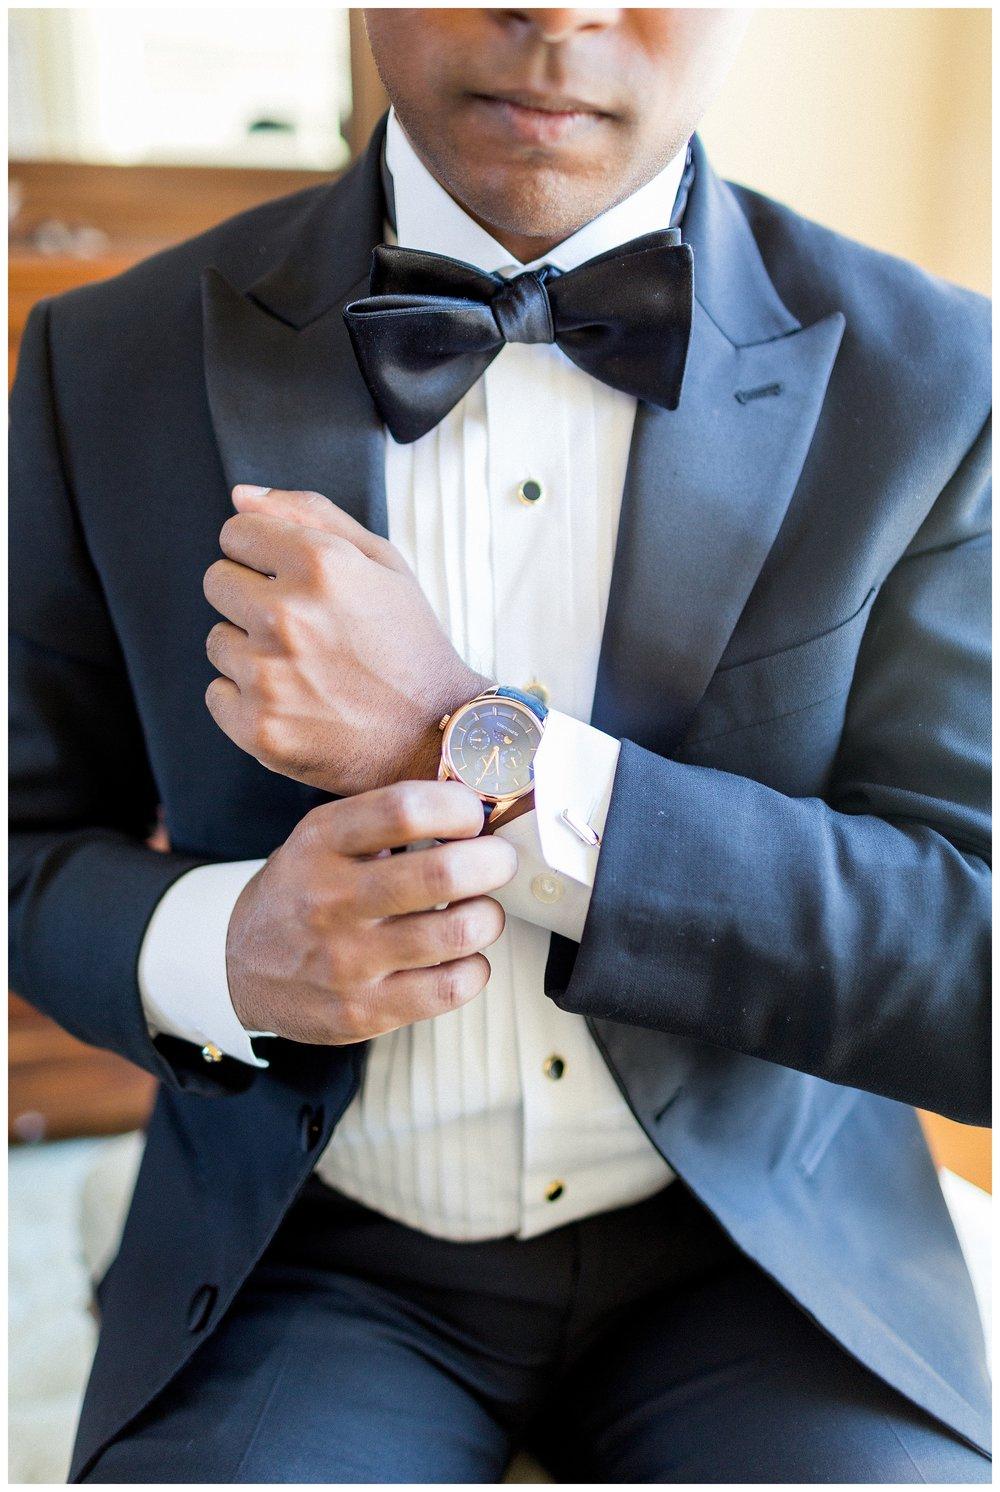 Stone Tower Winery Wedding | Virginia Winter Wedding | VA Wedding Photographer Kir Tuben_0031.jpg